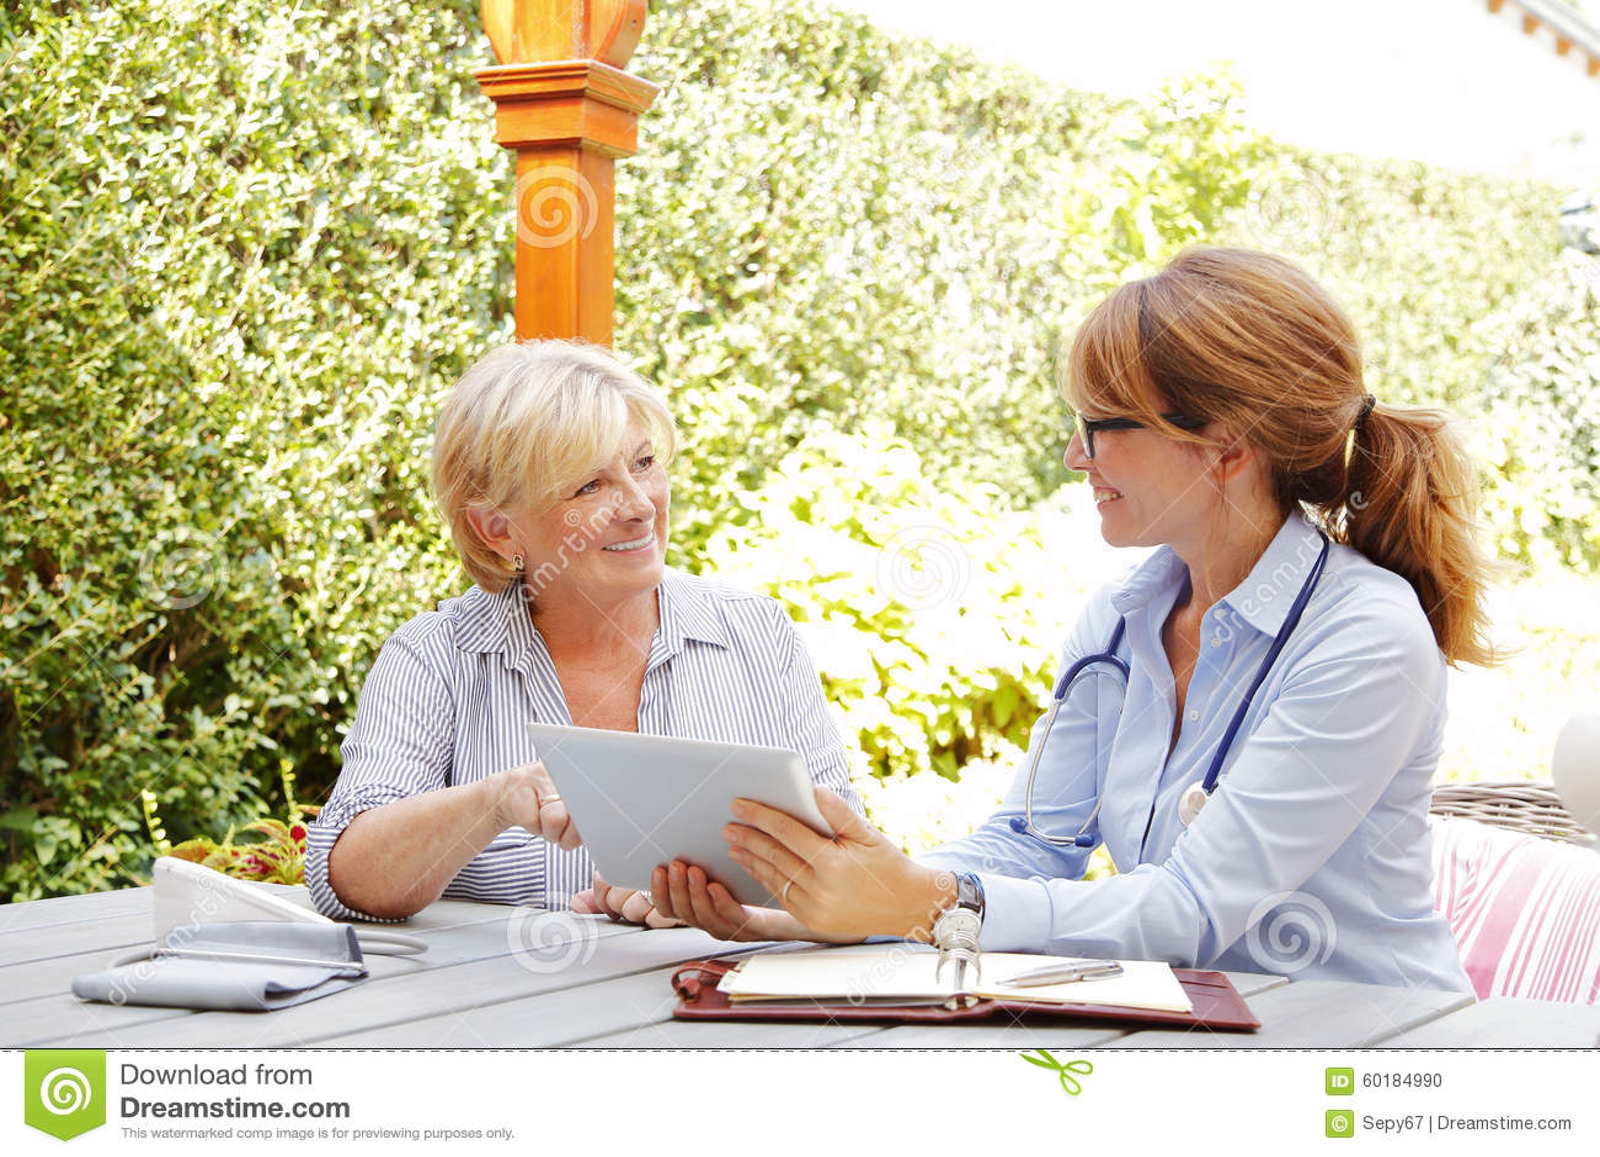 Home Healthcare Stock Photo Image 60184990